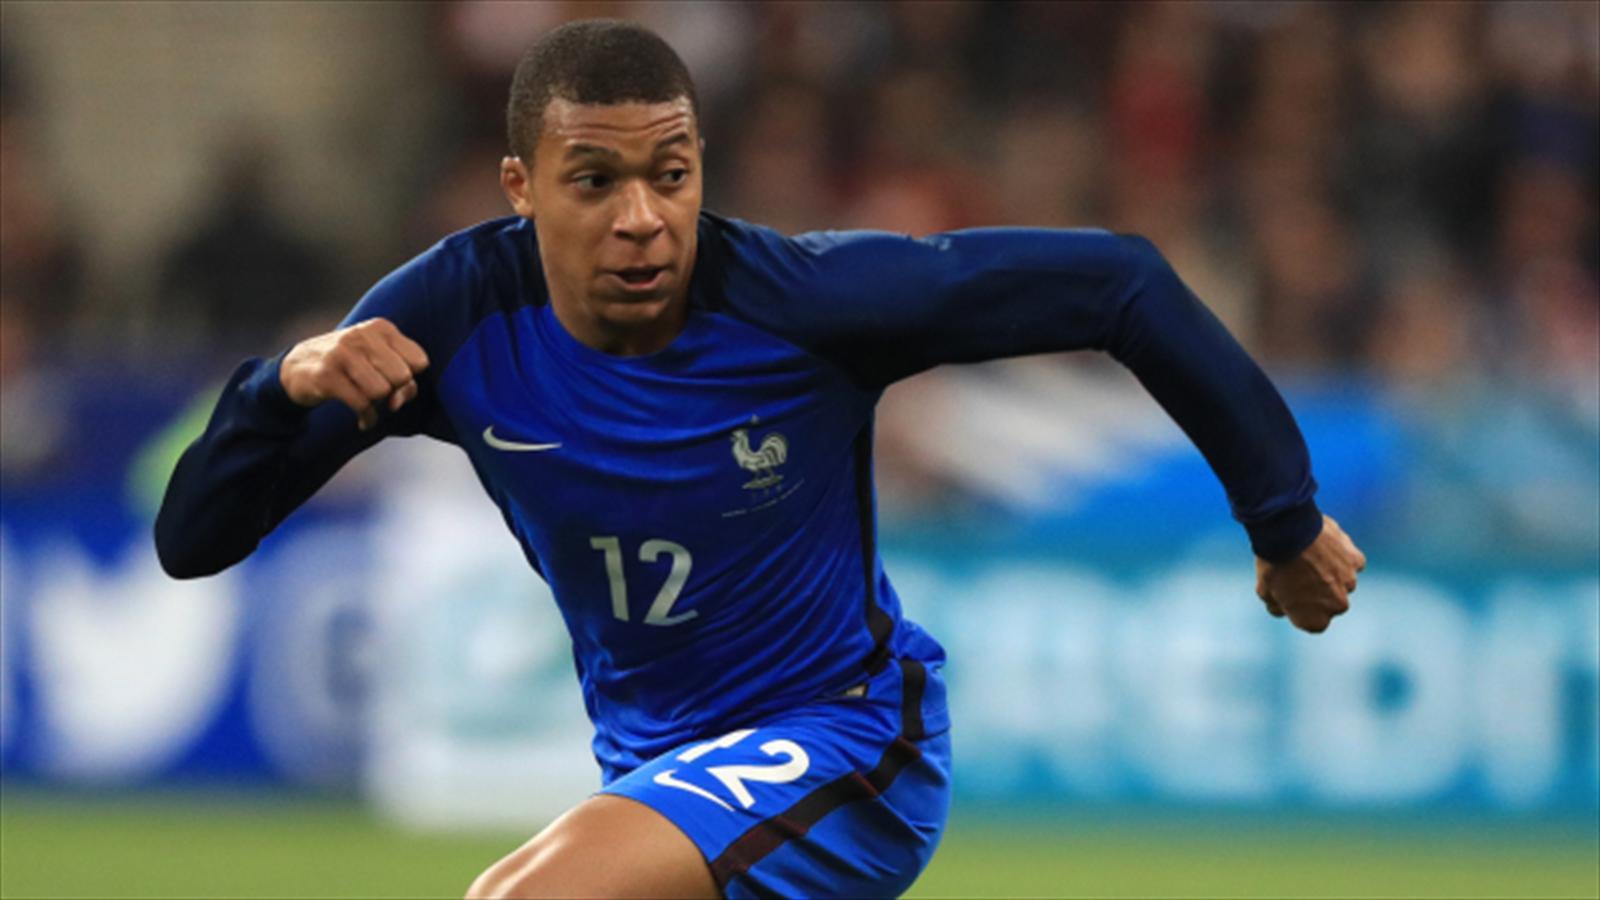 Kylian Mbappe reveals pride at France debut